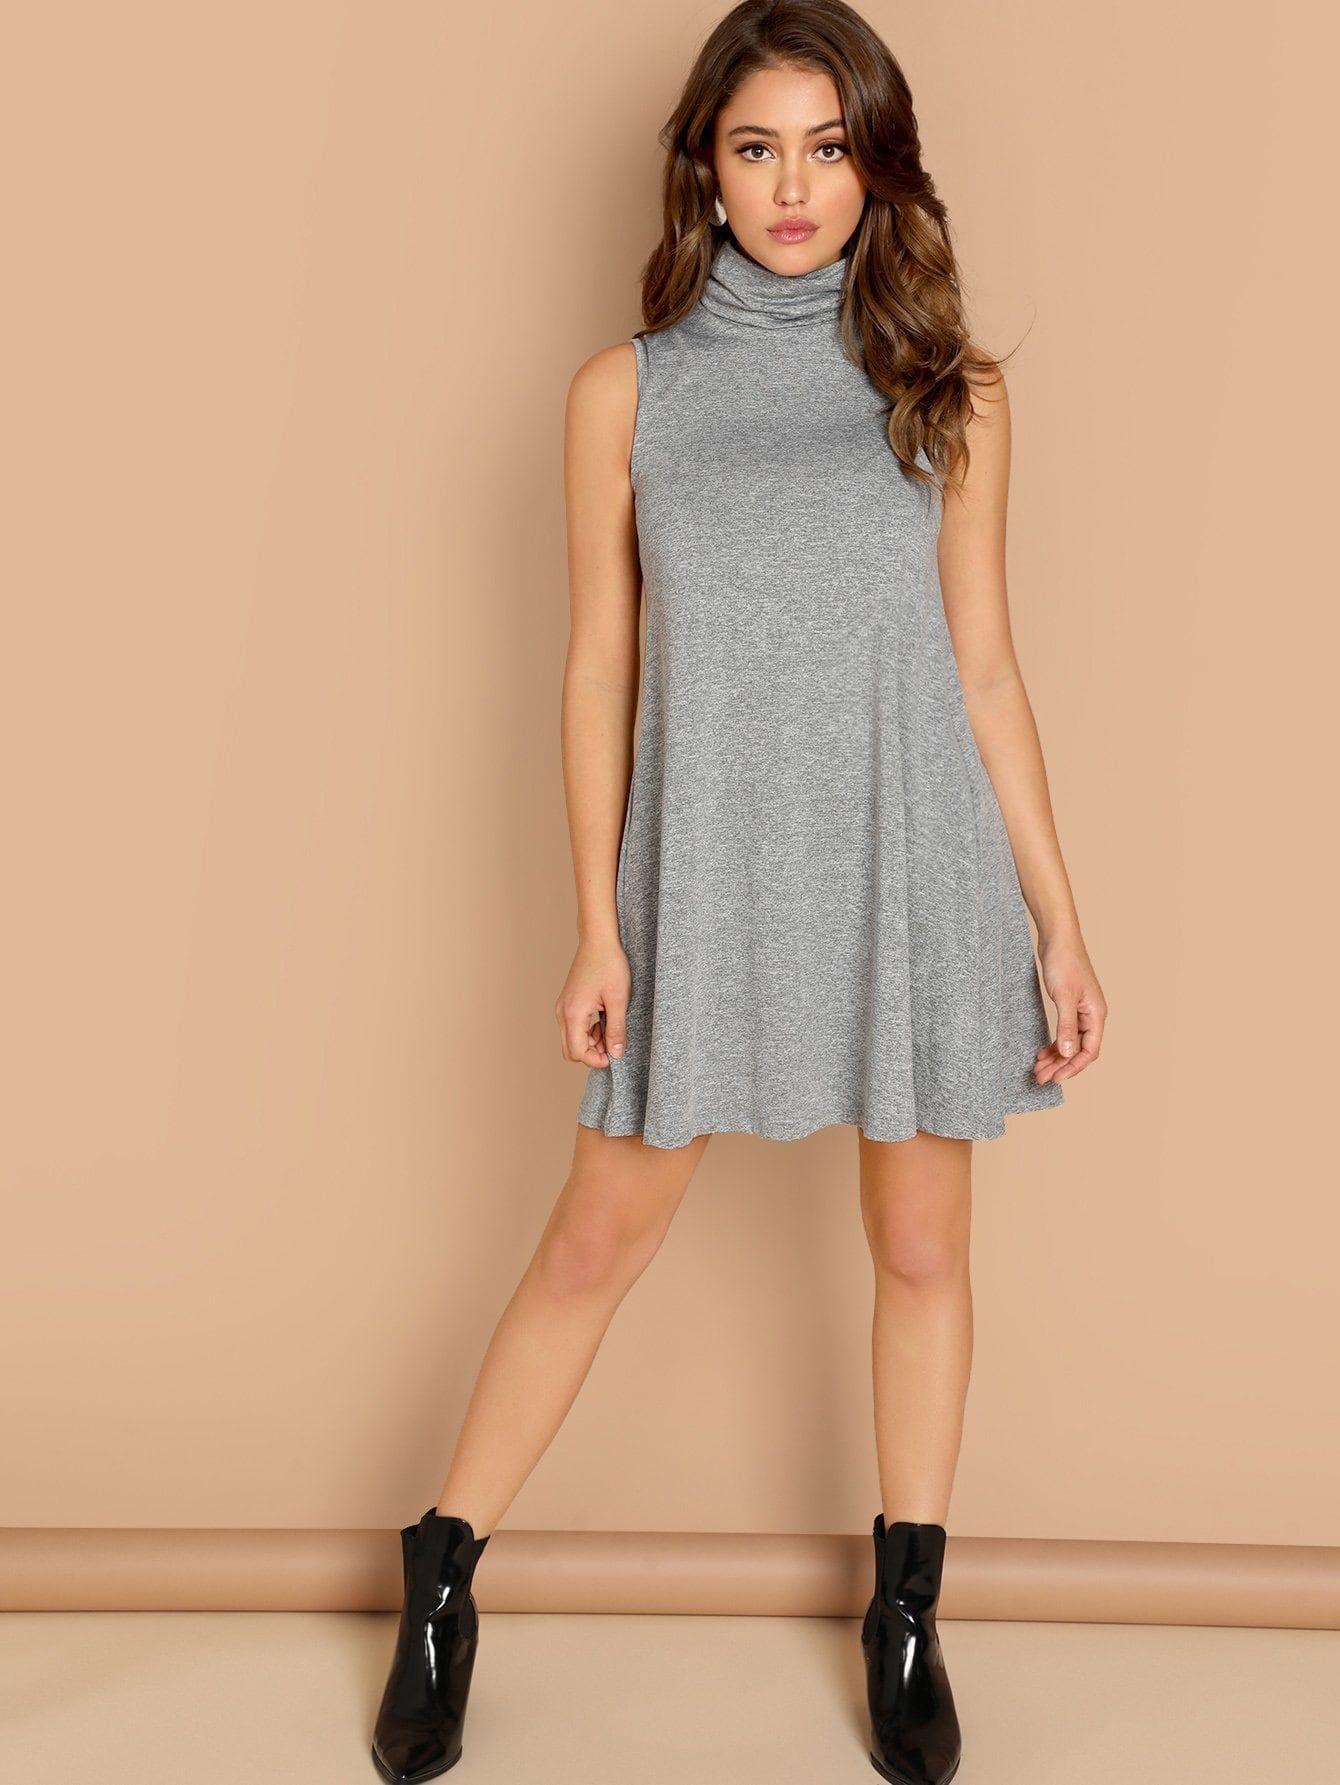 f16647d9f3 Casual Tshirt Plain Shift Trapeze High Neck Sleeveless Grey Short Length  Sleeveless Heathered Knit Dress